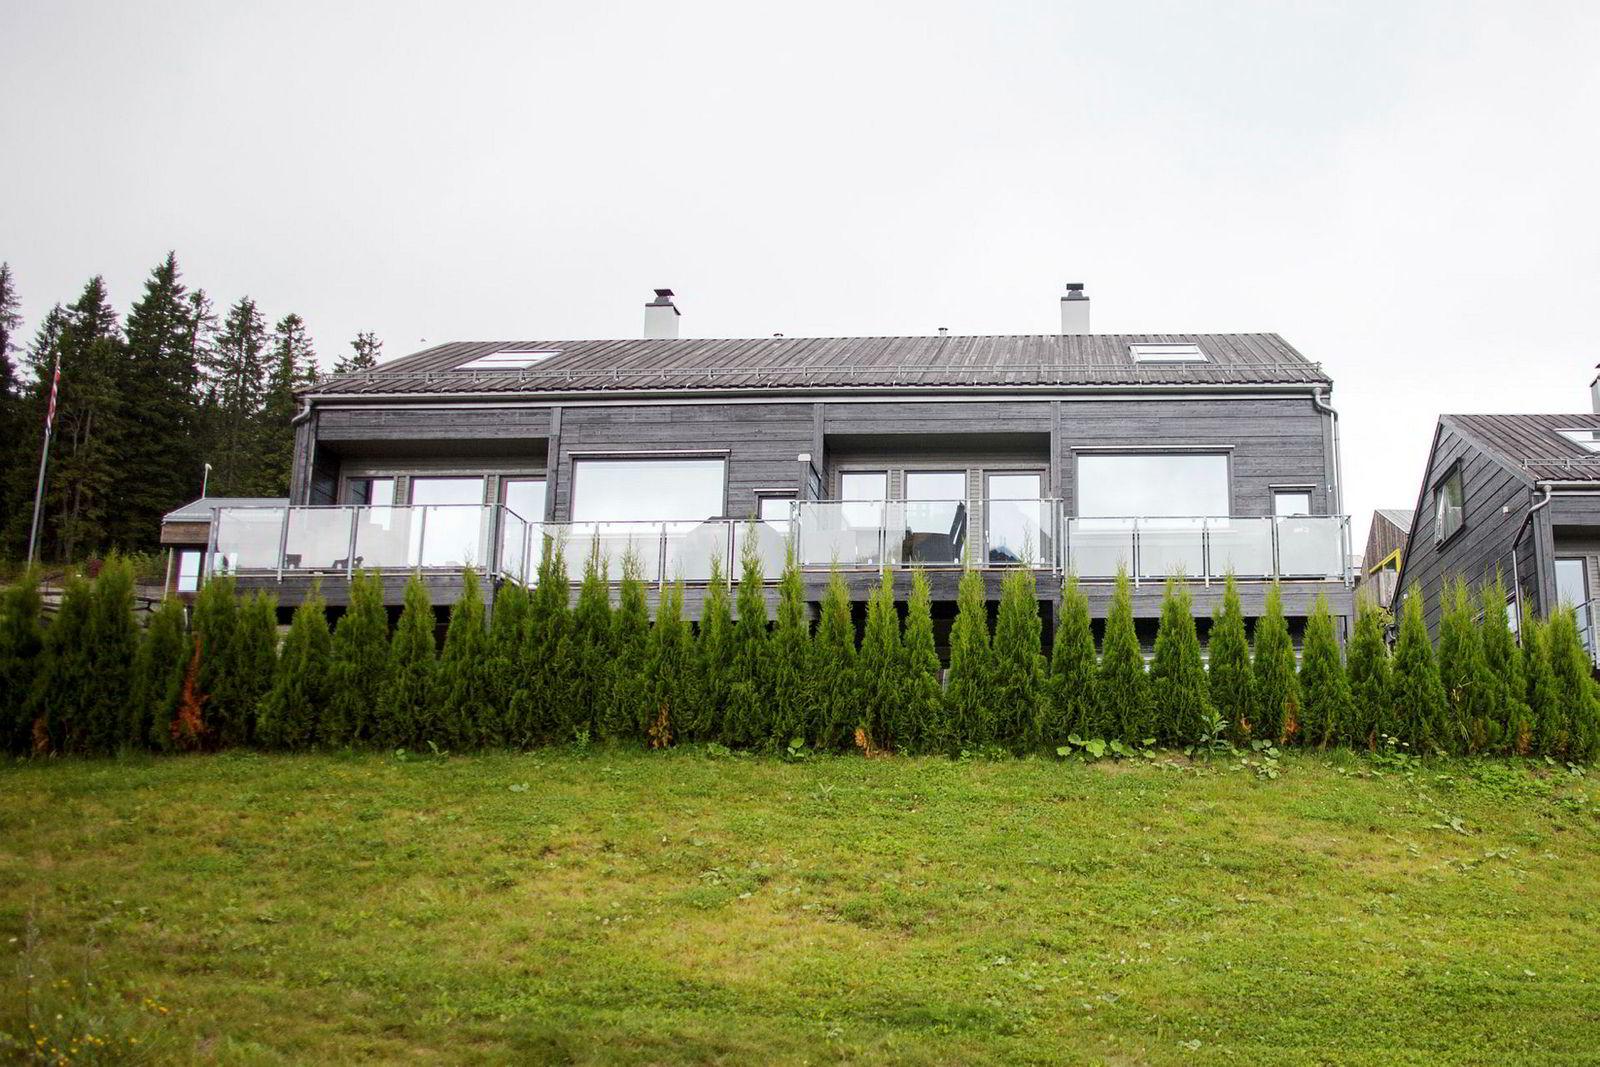 Marit Bjørgens hus i Thorleif Haugs vei i Holmenkollen.